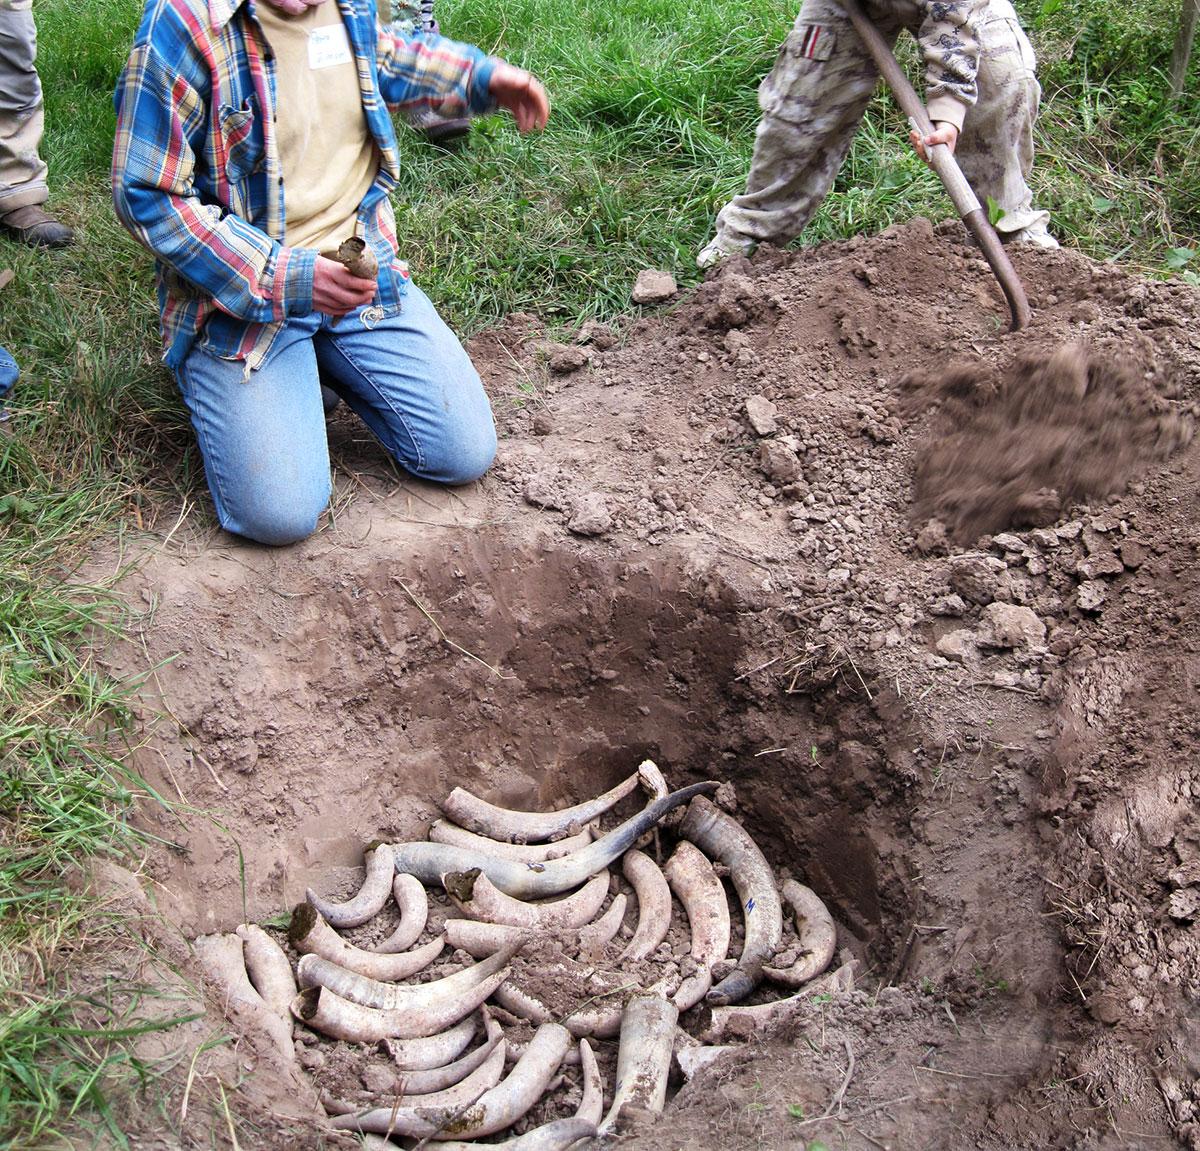 biodynamic-cow-horn-burying-craftsmanship